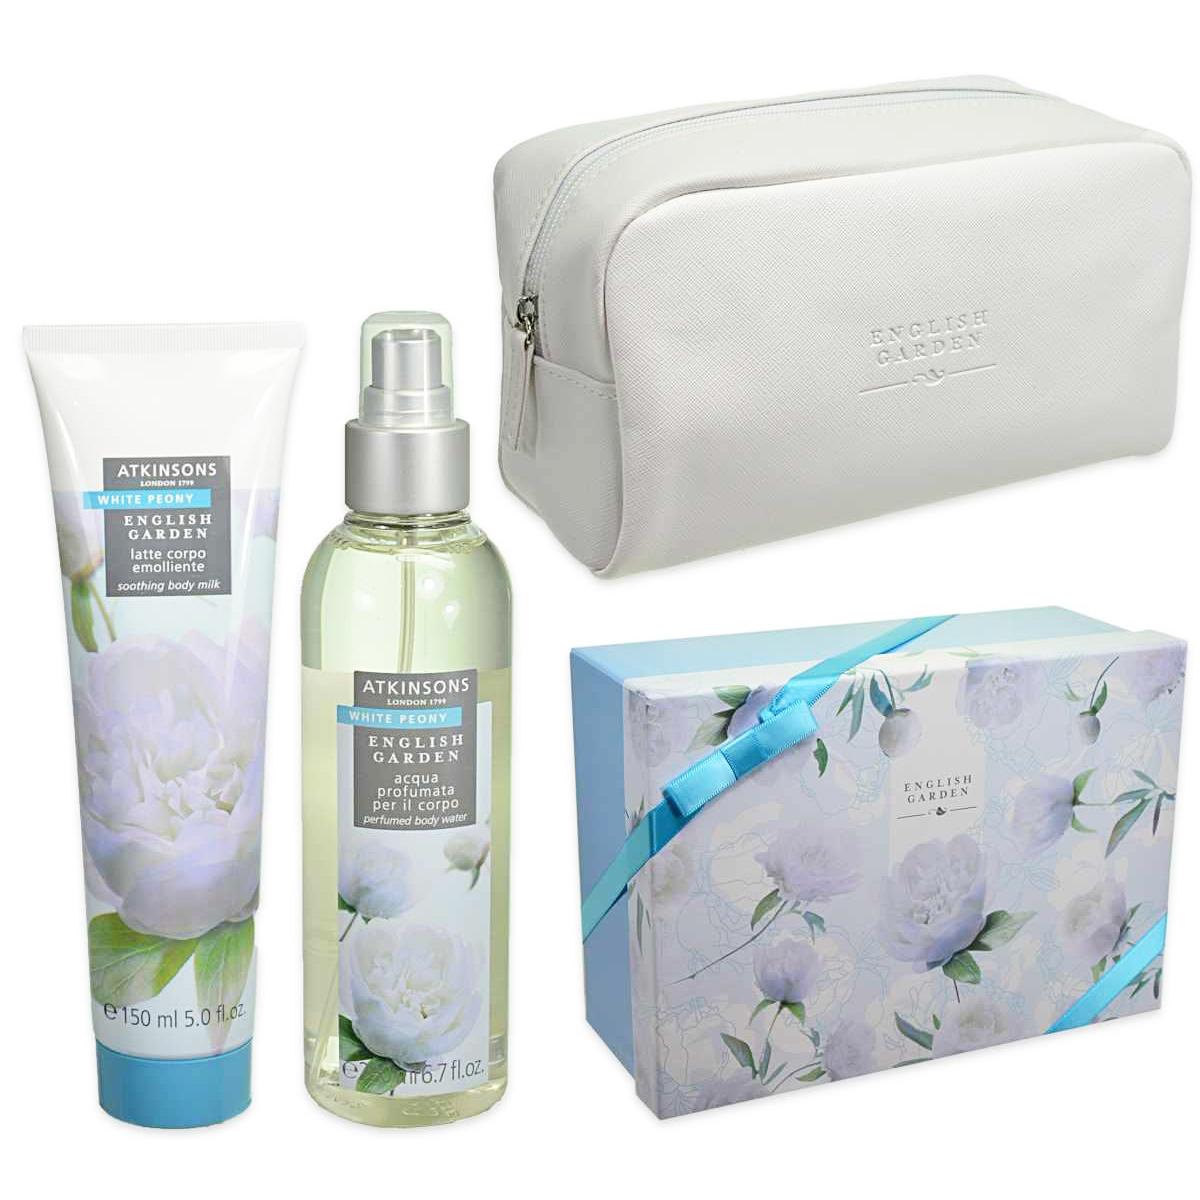 Atkinsons  Cofanetto english garden white peony  body water 200 ml  body lotion 150 ml  pouch